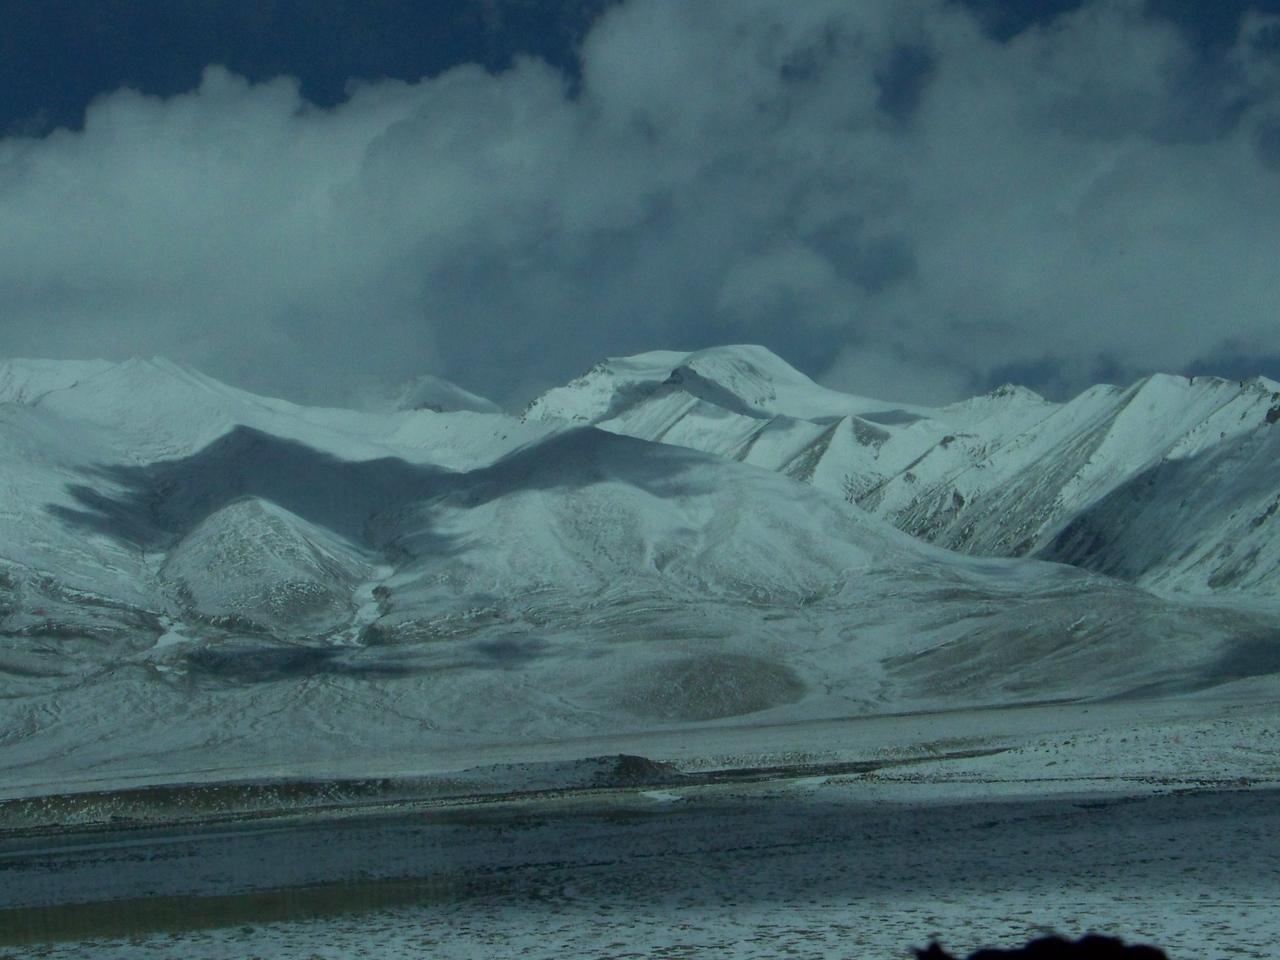 0114 - Scenery on Train Trip Between Beijing and Lhasa.JPG